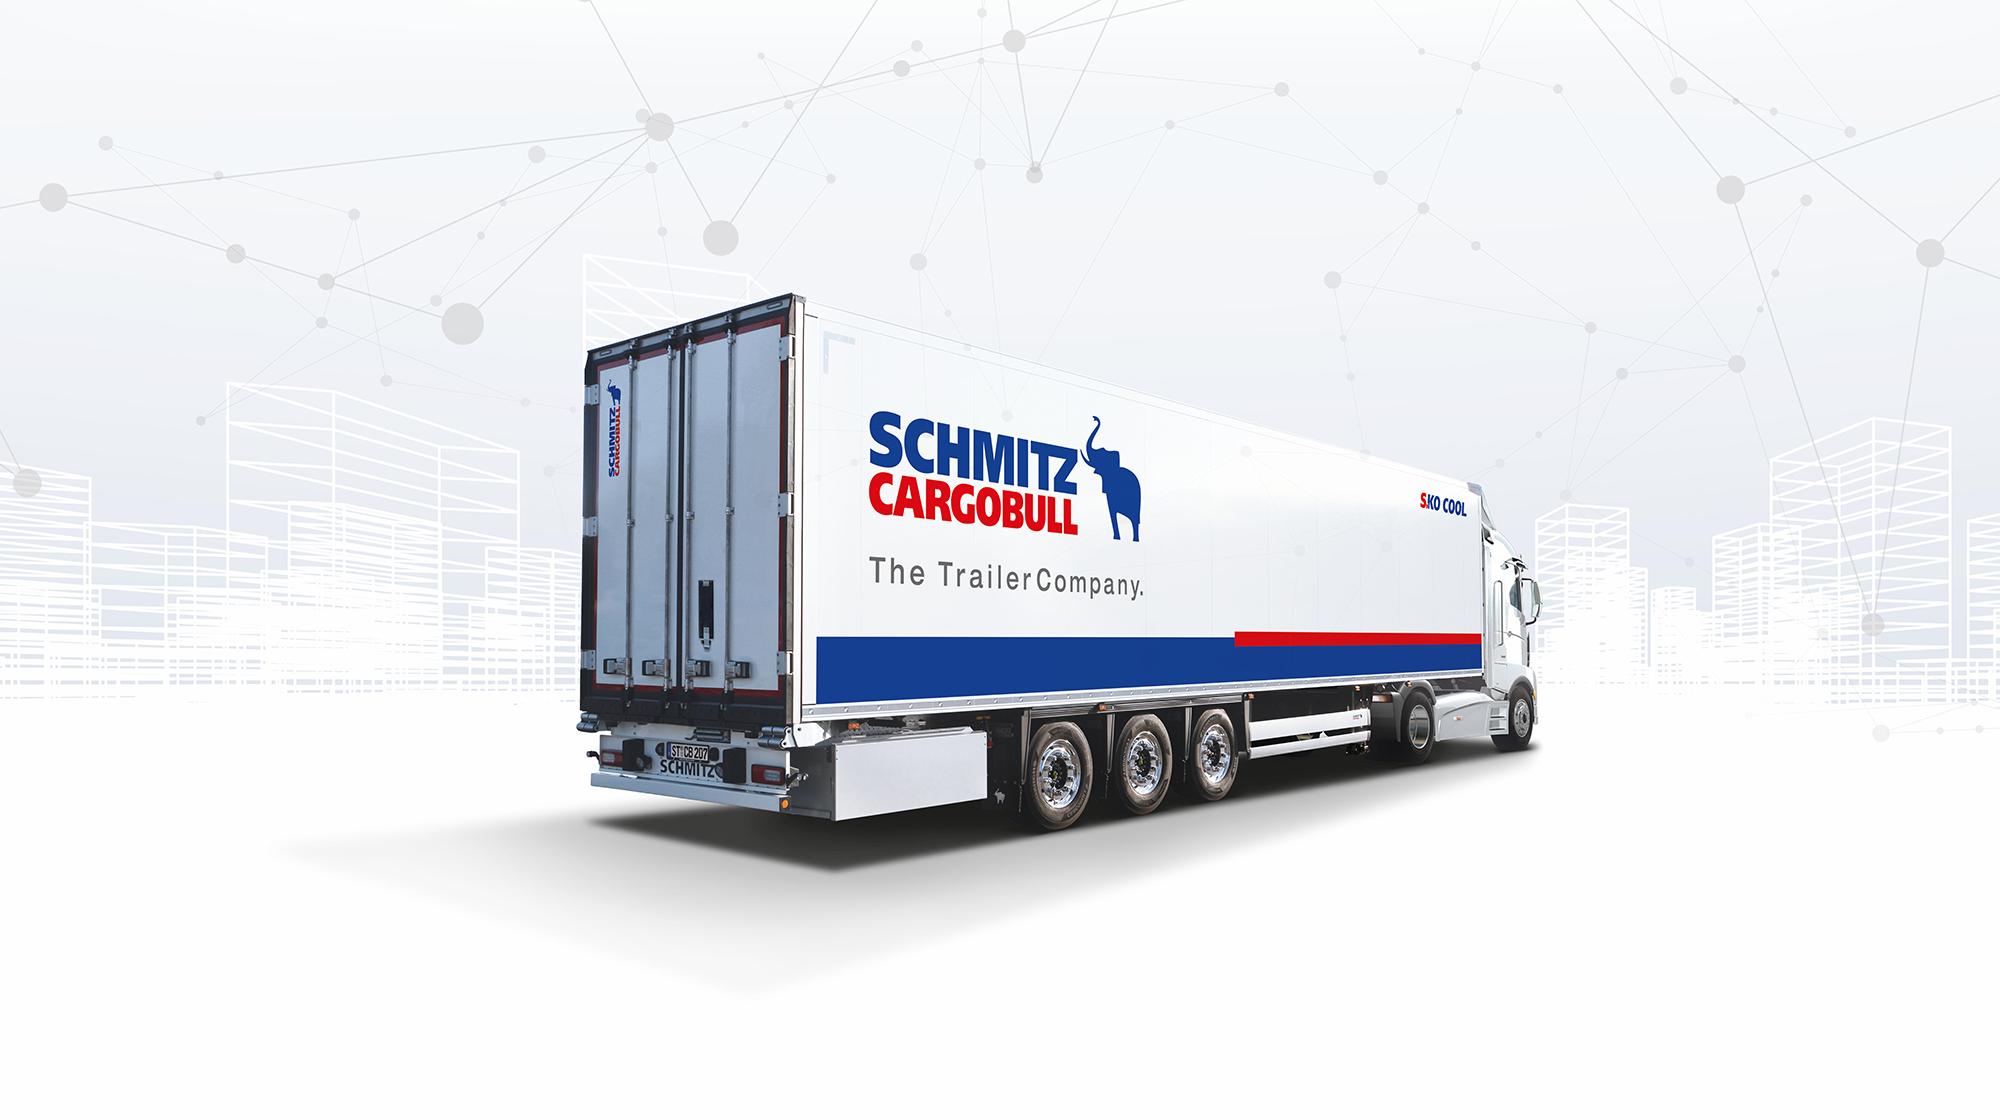 schmitz-cargobull-001.jpg